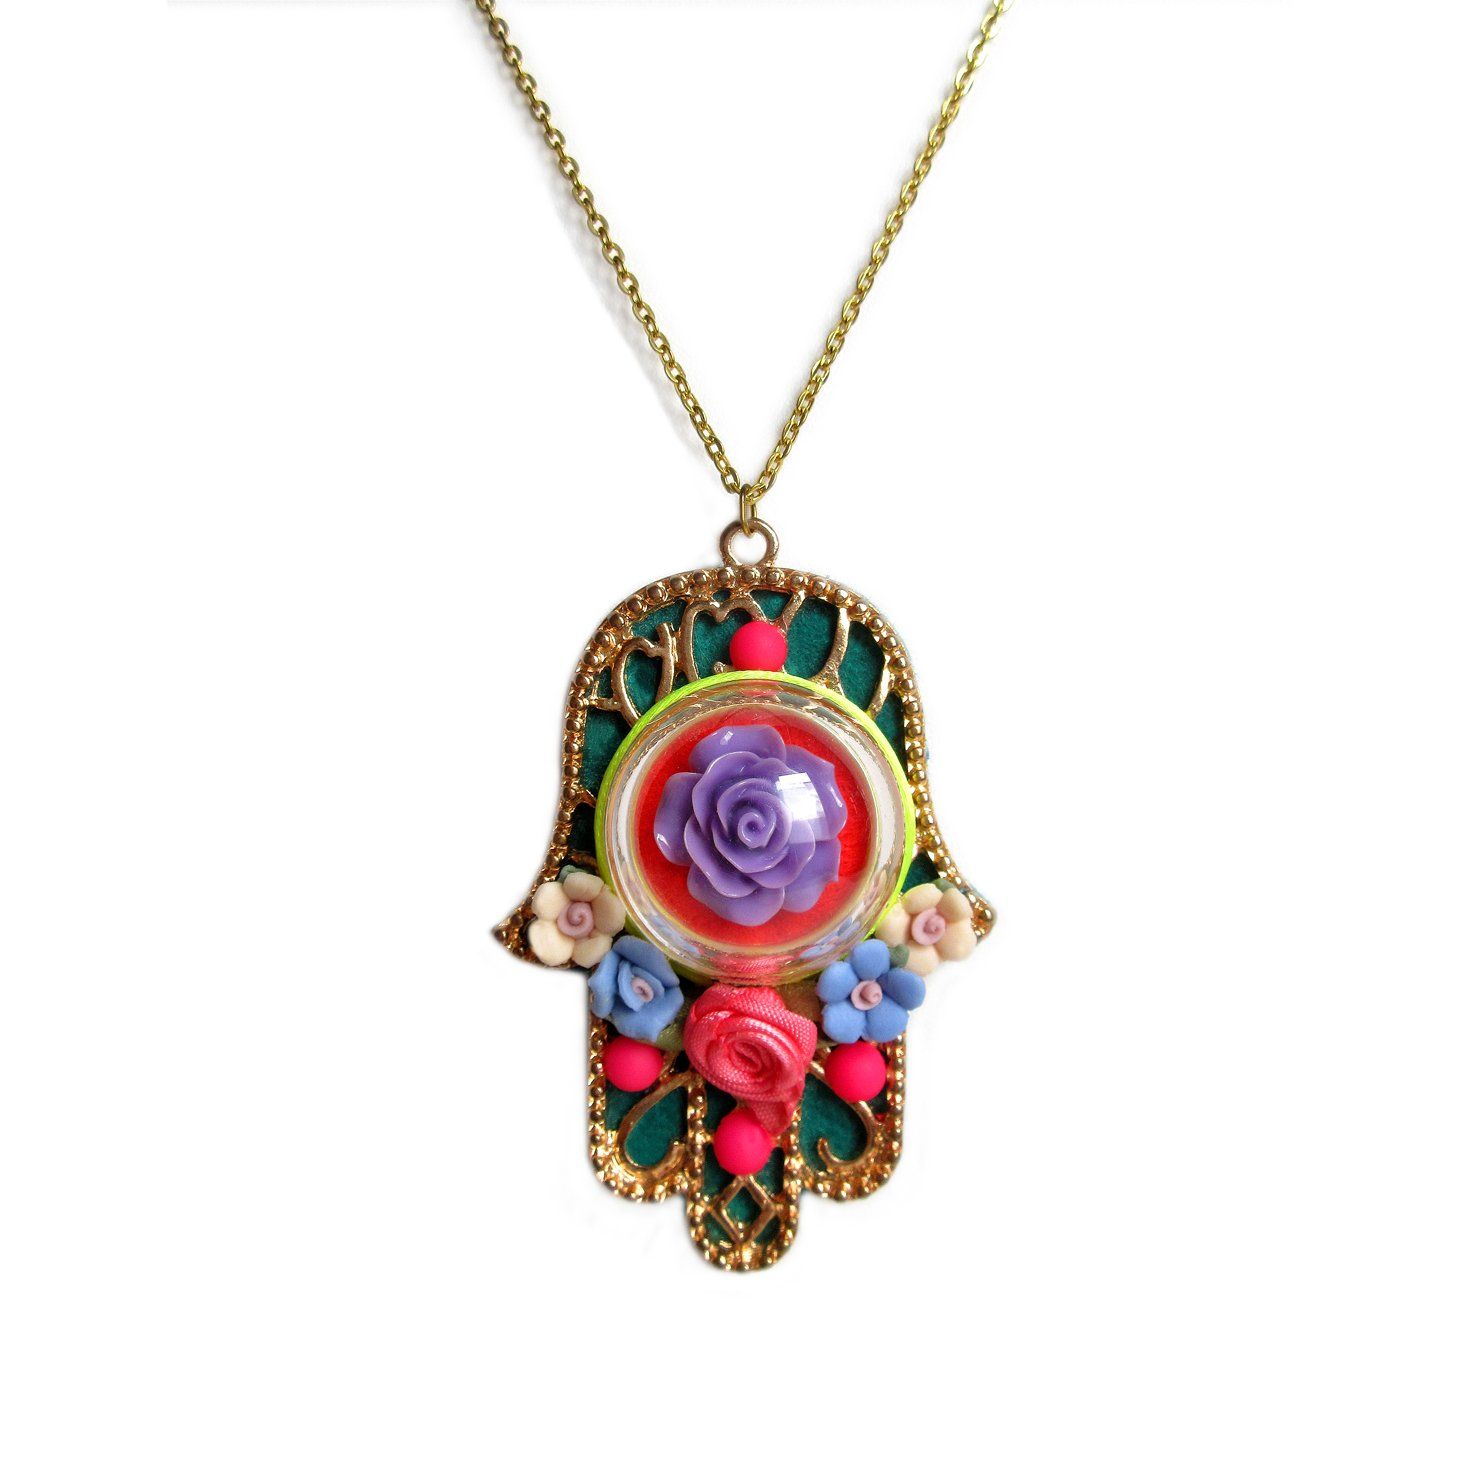 Mouchkine-jewelry-fashion-fatma-handnecklace-chic-kitsch-packshot.jpg